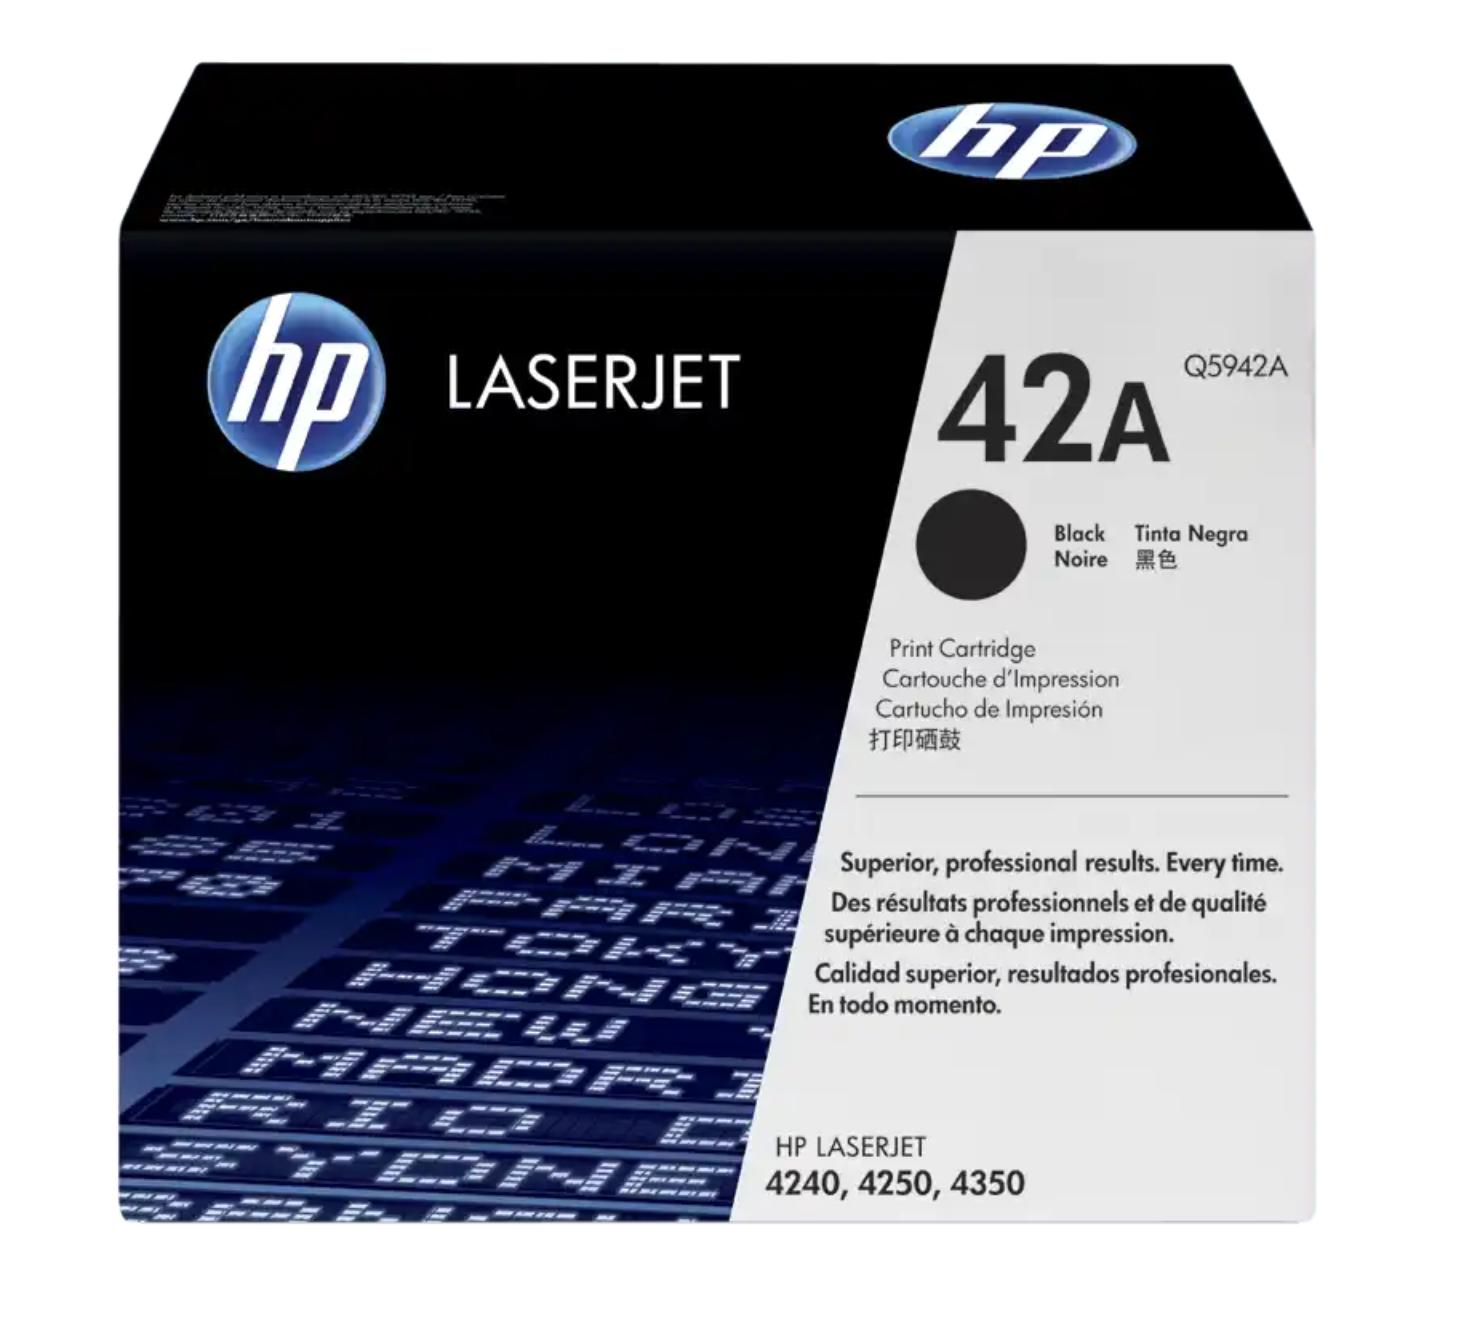 HP 42A 黑色原廠 LaserJet 碳粉Q5942A